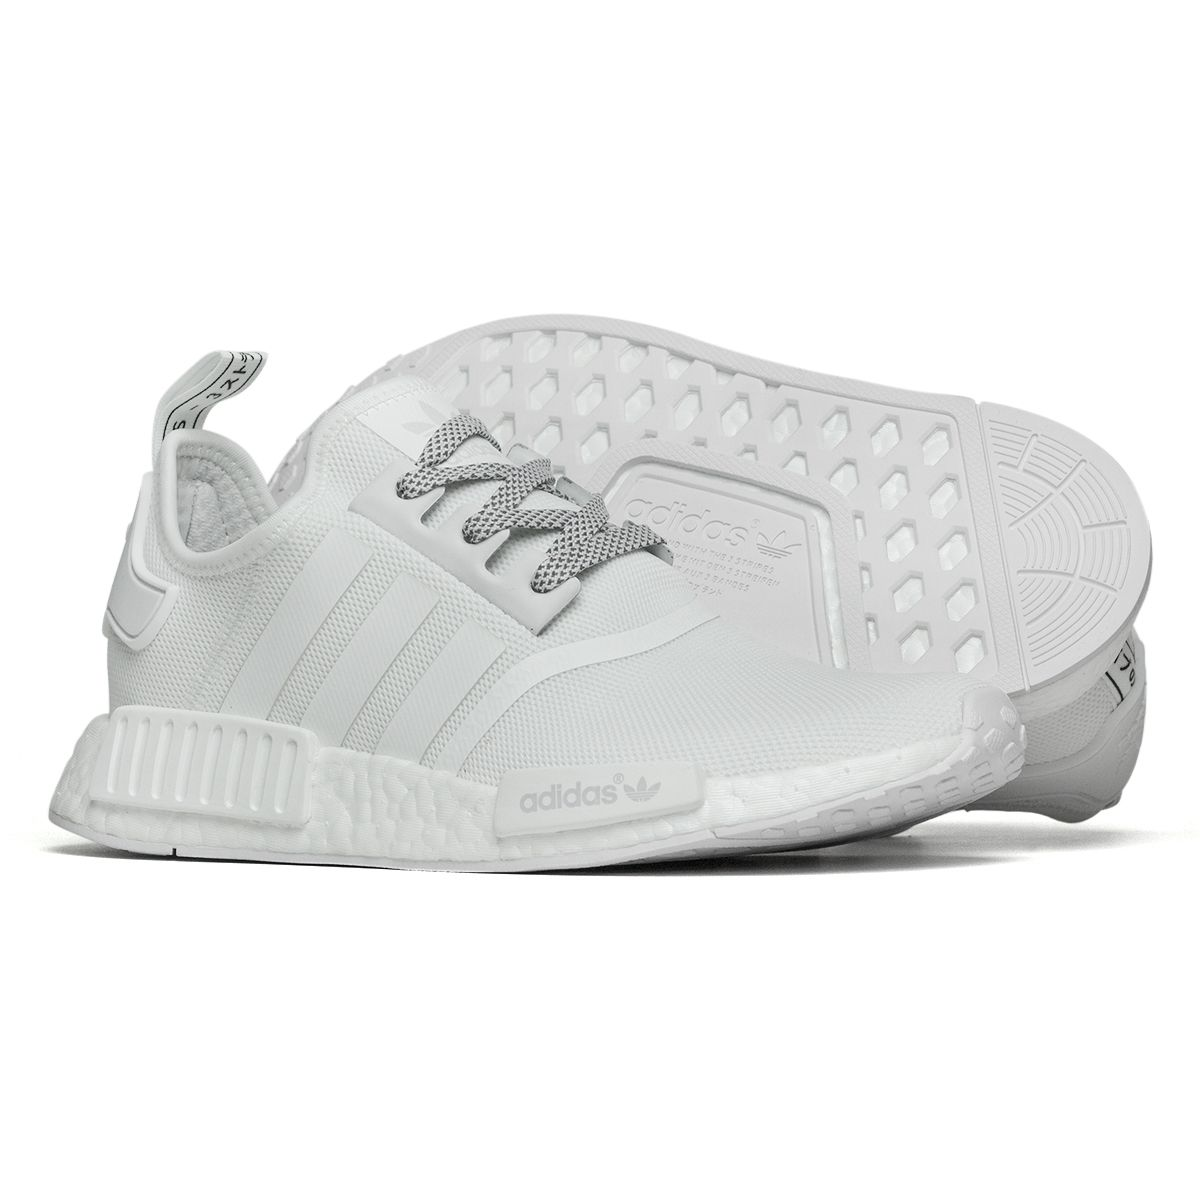 Tênis Adidas NMD R1 Branco - Maze  25579aba7de